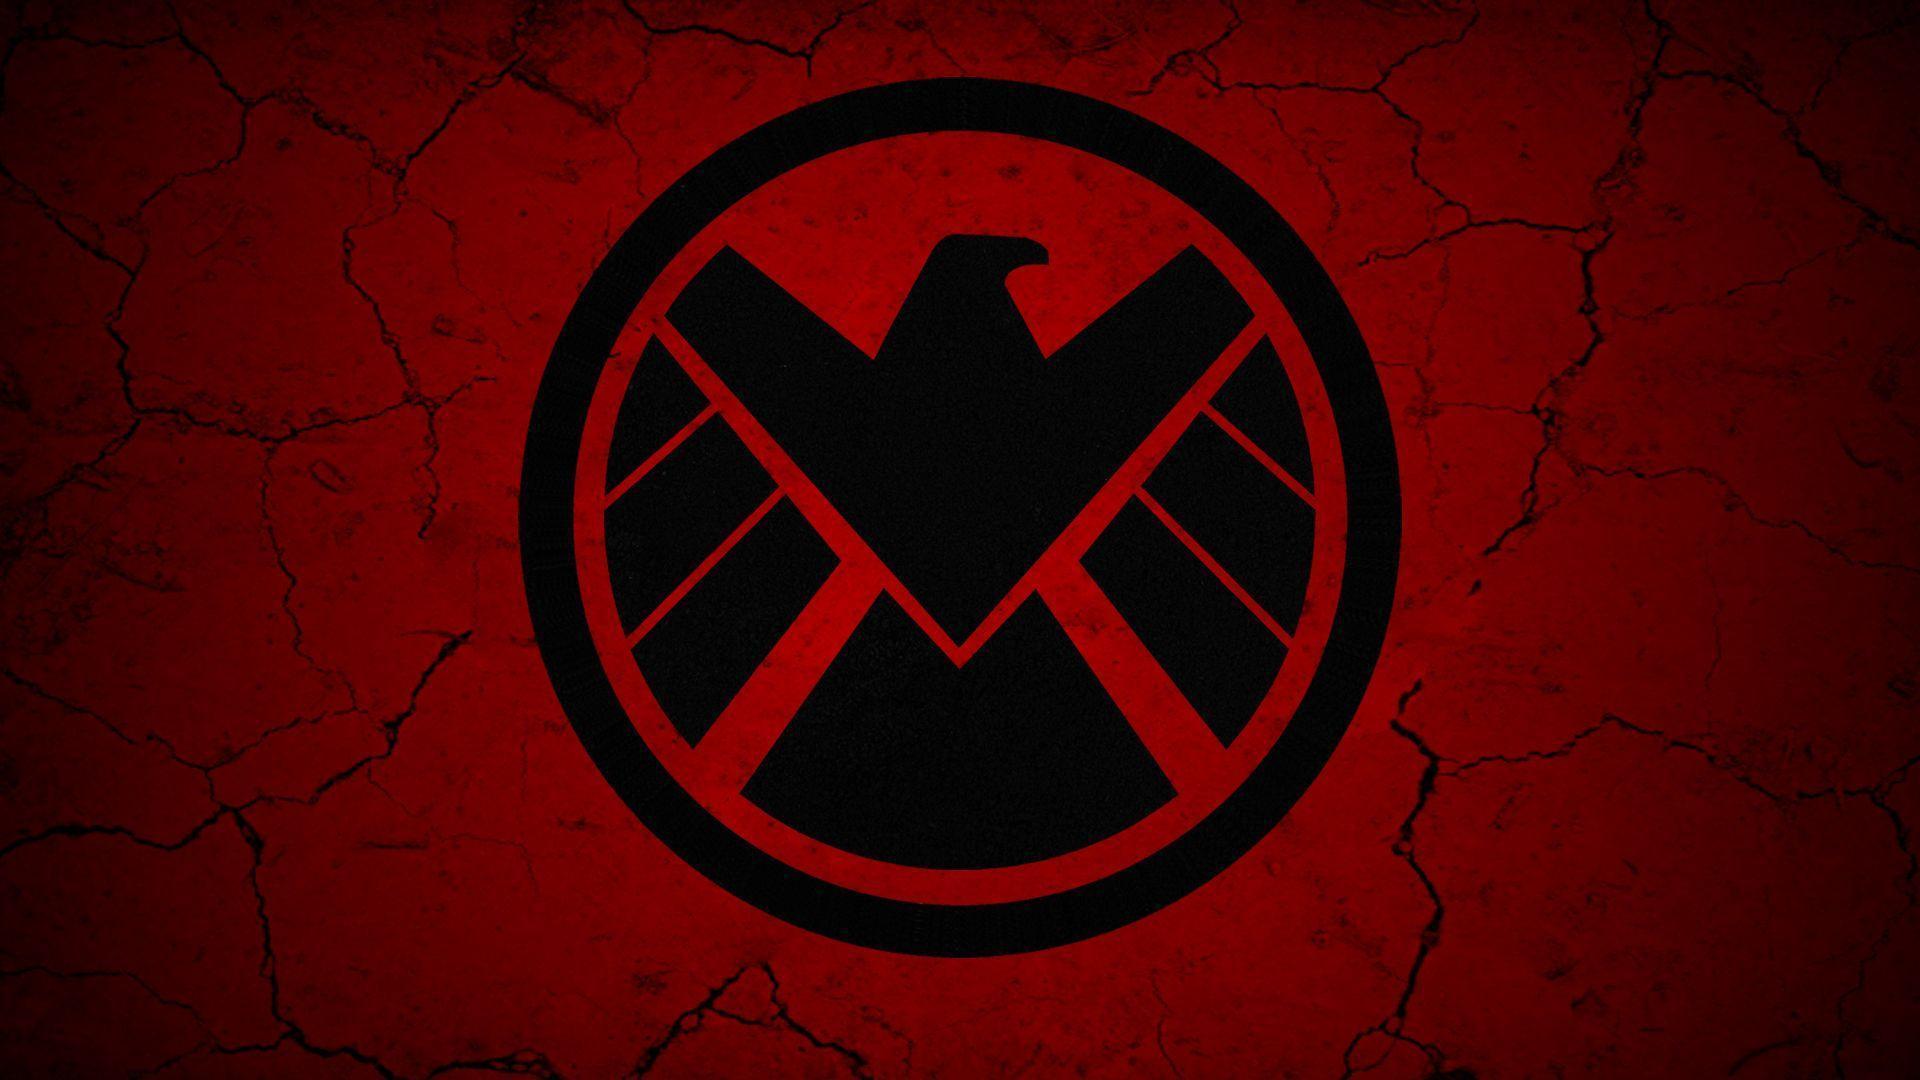 Agents Of S.H.I.E.L.D Teams Background 3